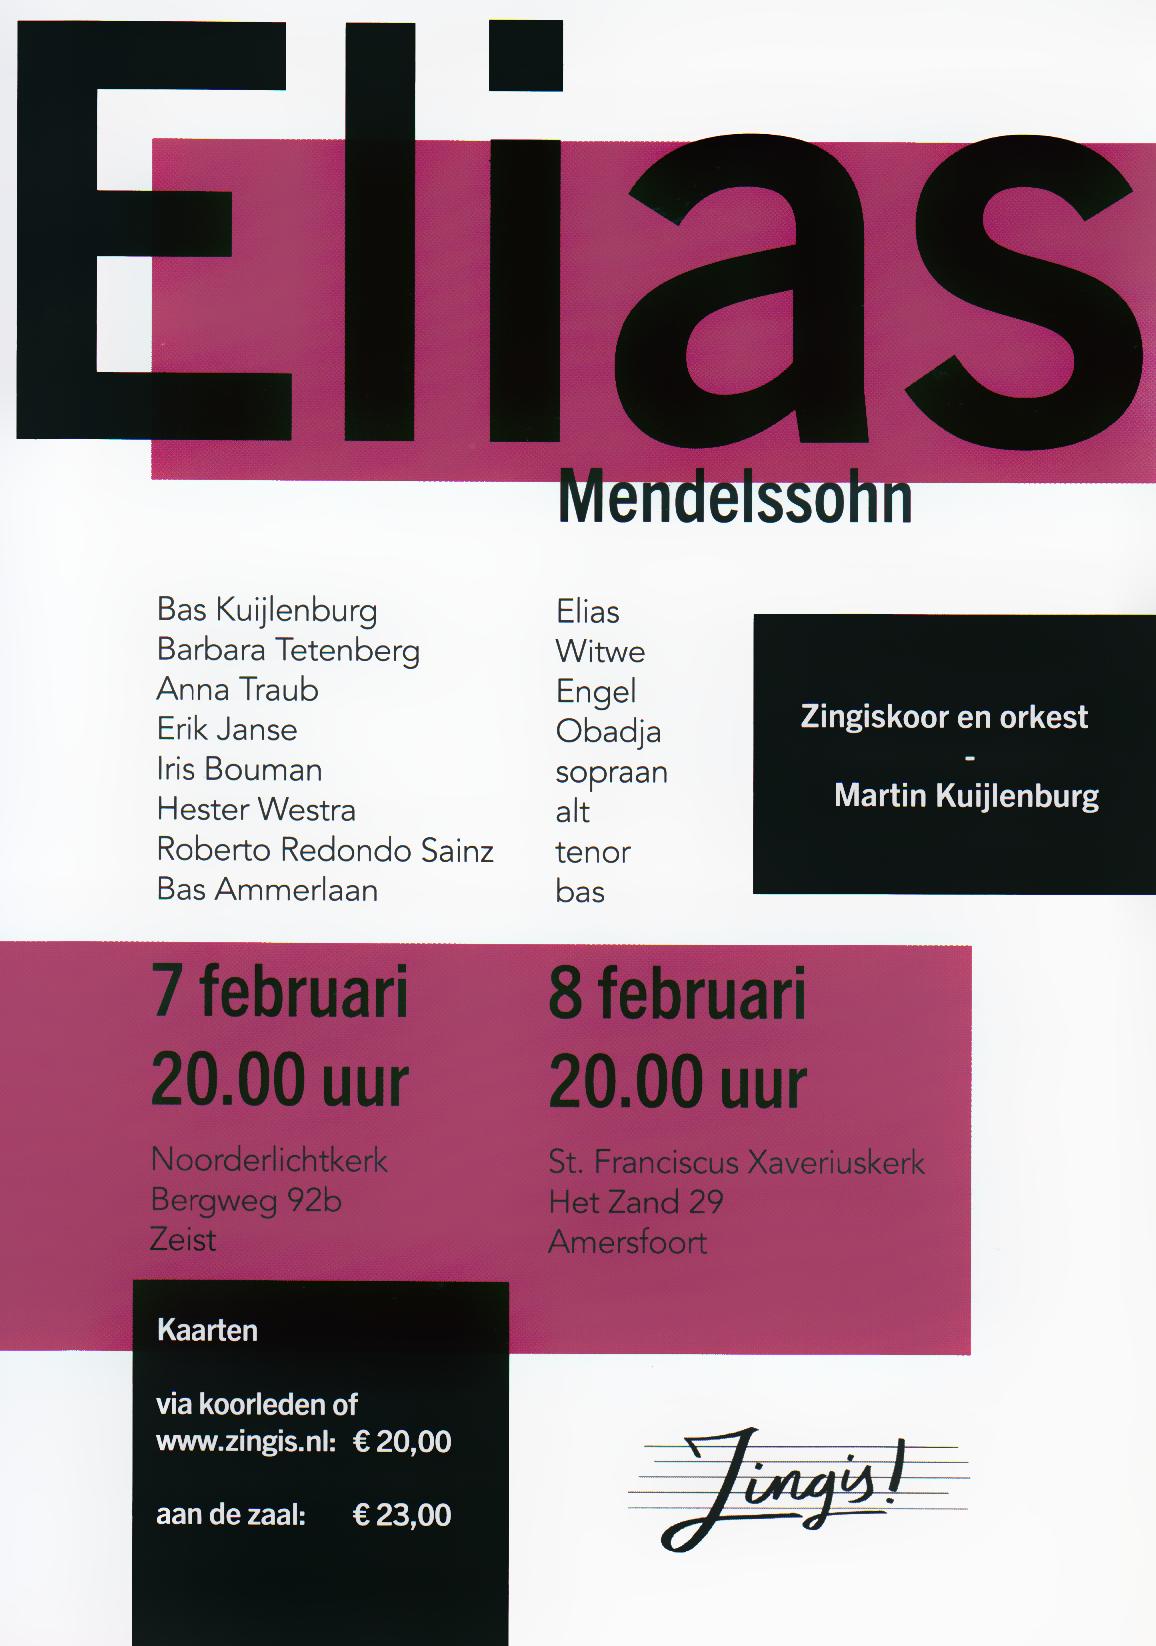 Elias – Mendelssohn